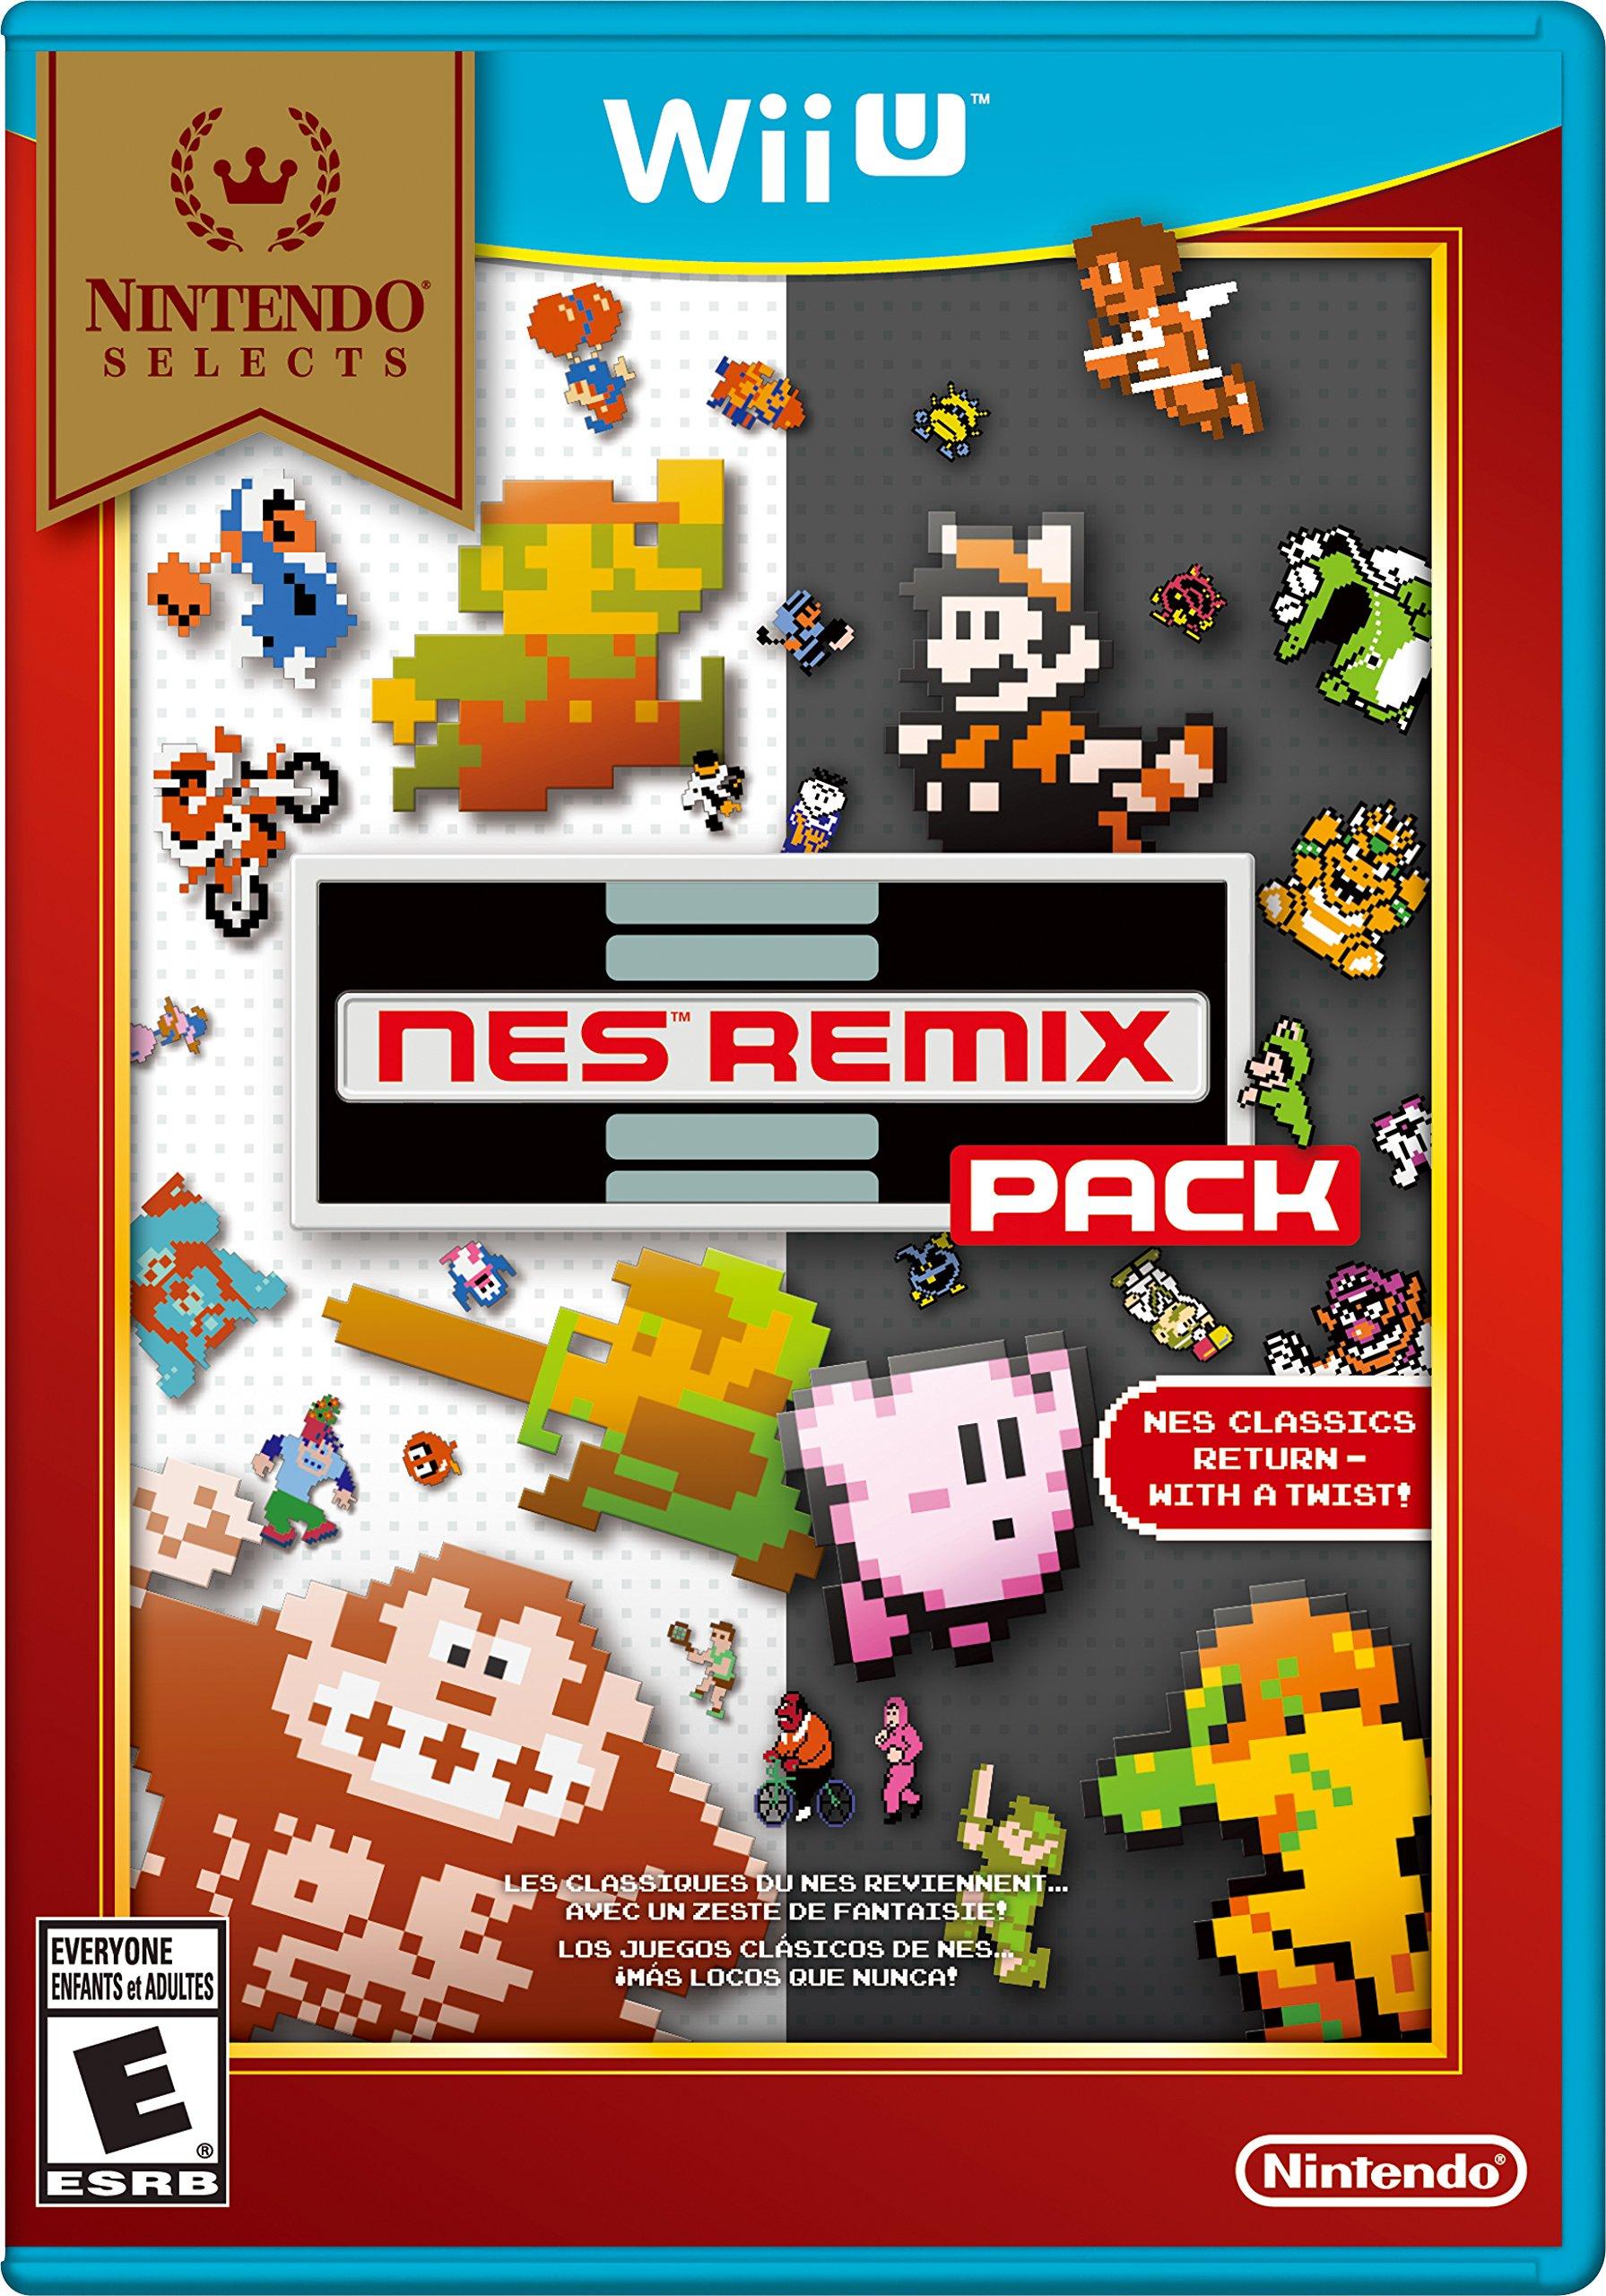 Amazon Com Nintendo Selects Nes Remix Pack Nintendo Of America